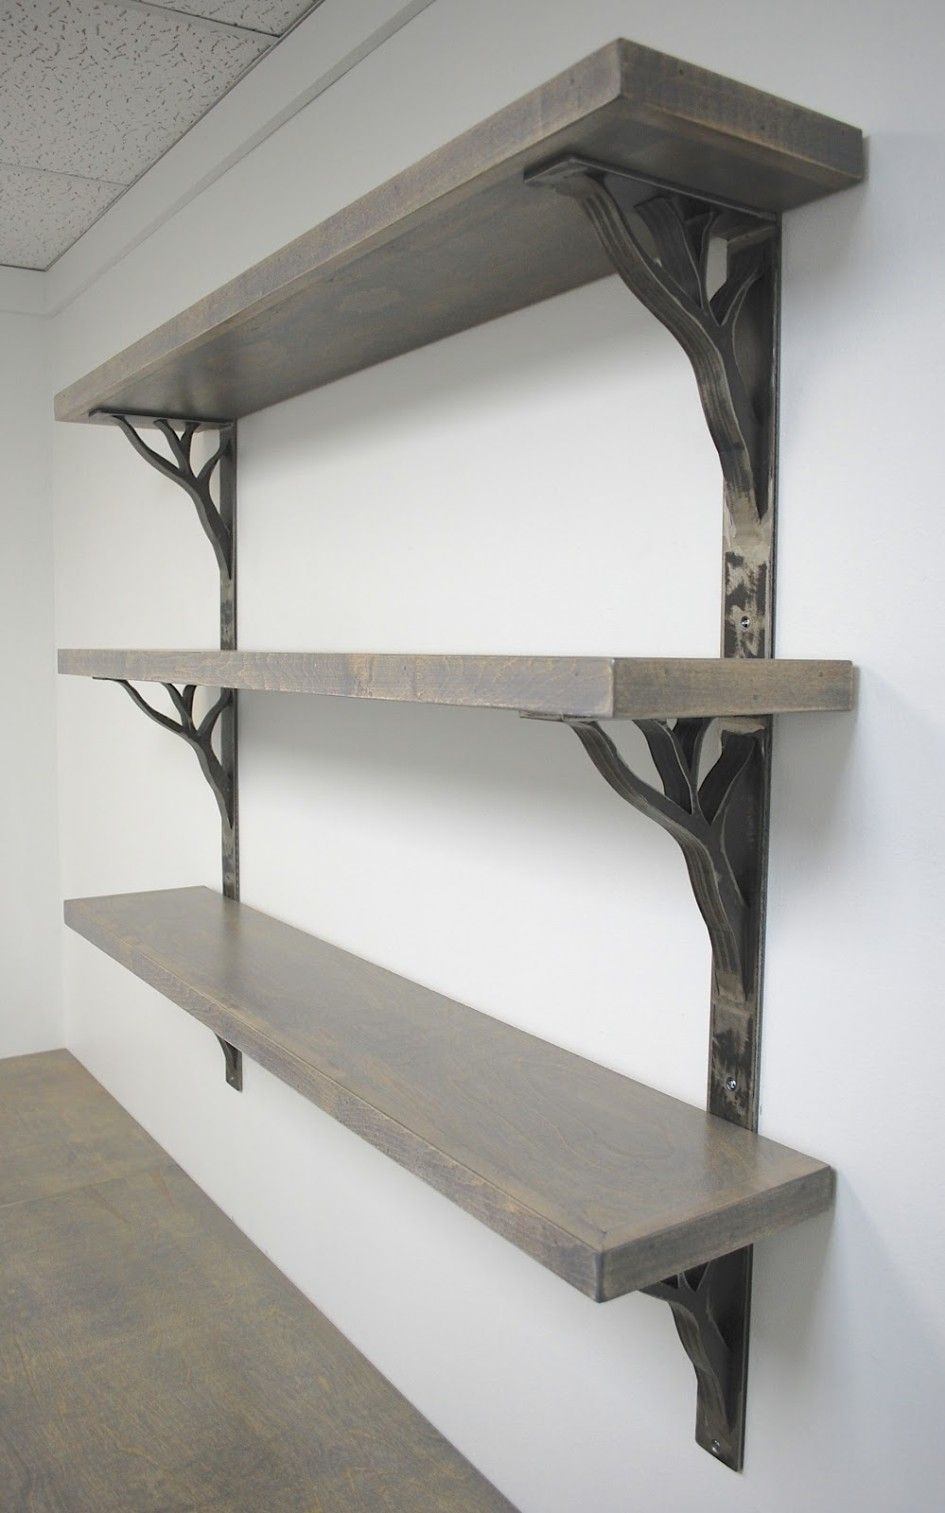 Cool Shelf Brackets Shelf Brackets Design Shelves Cool Shelves